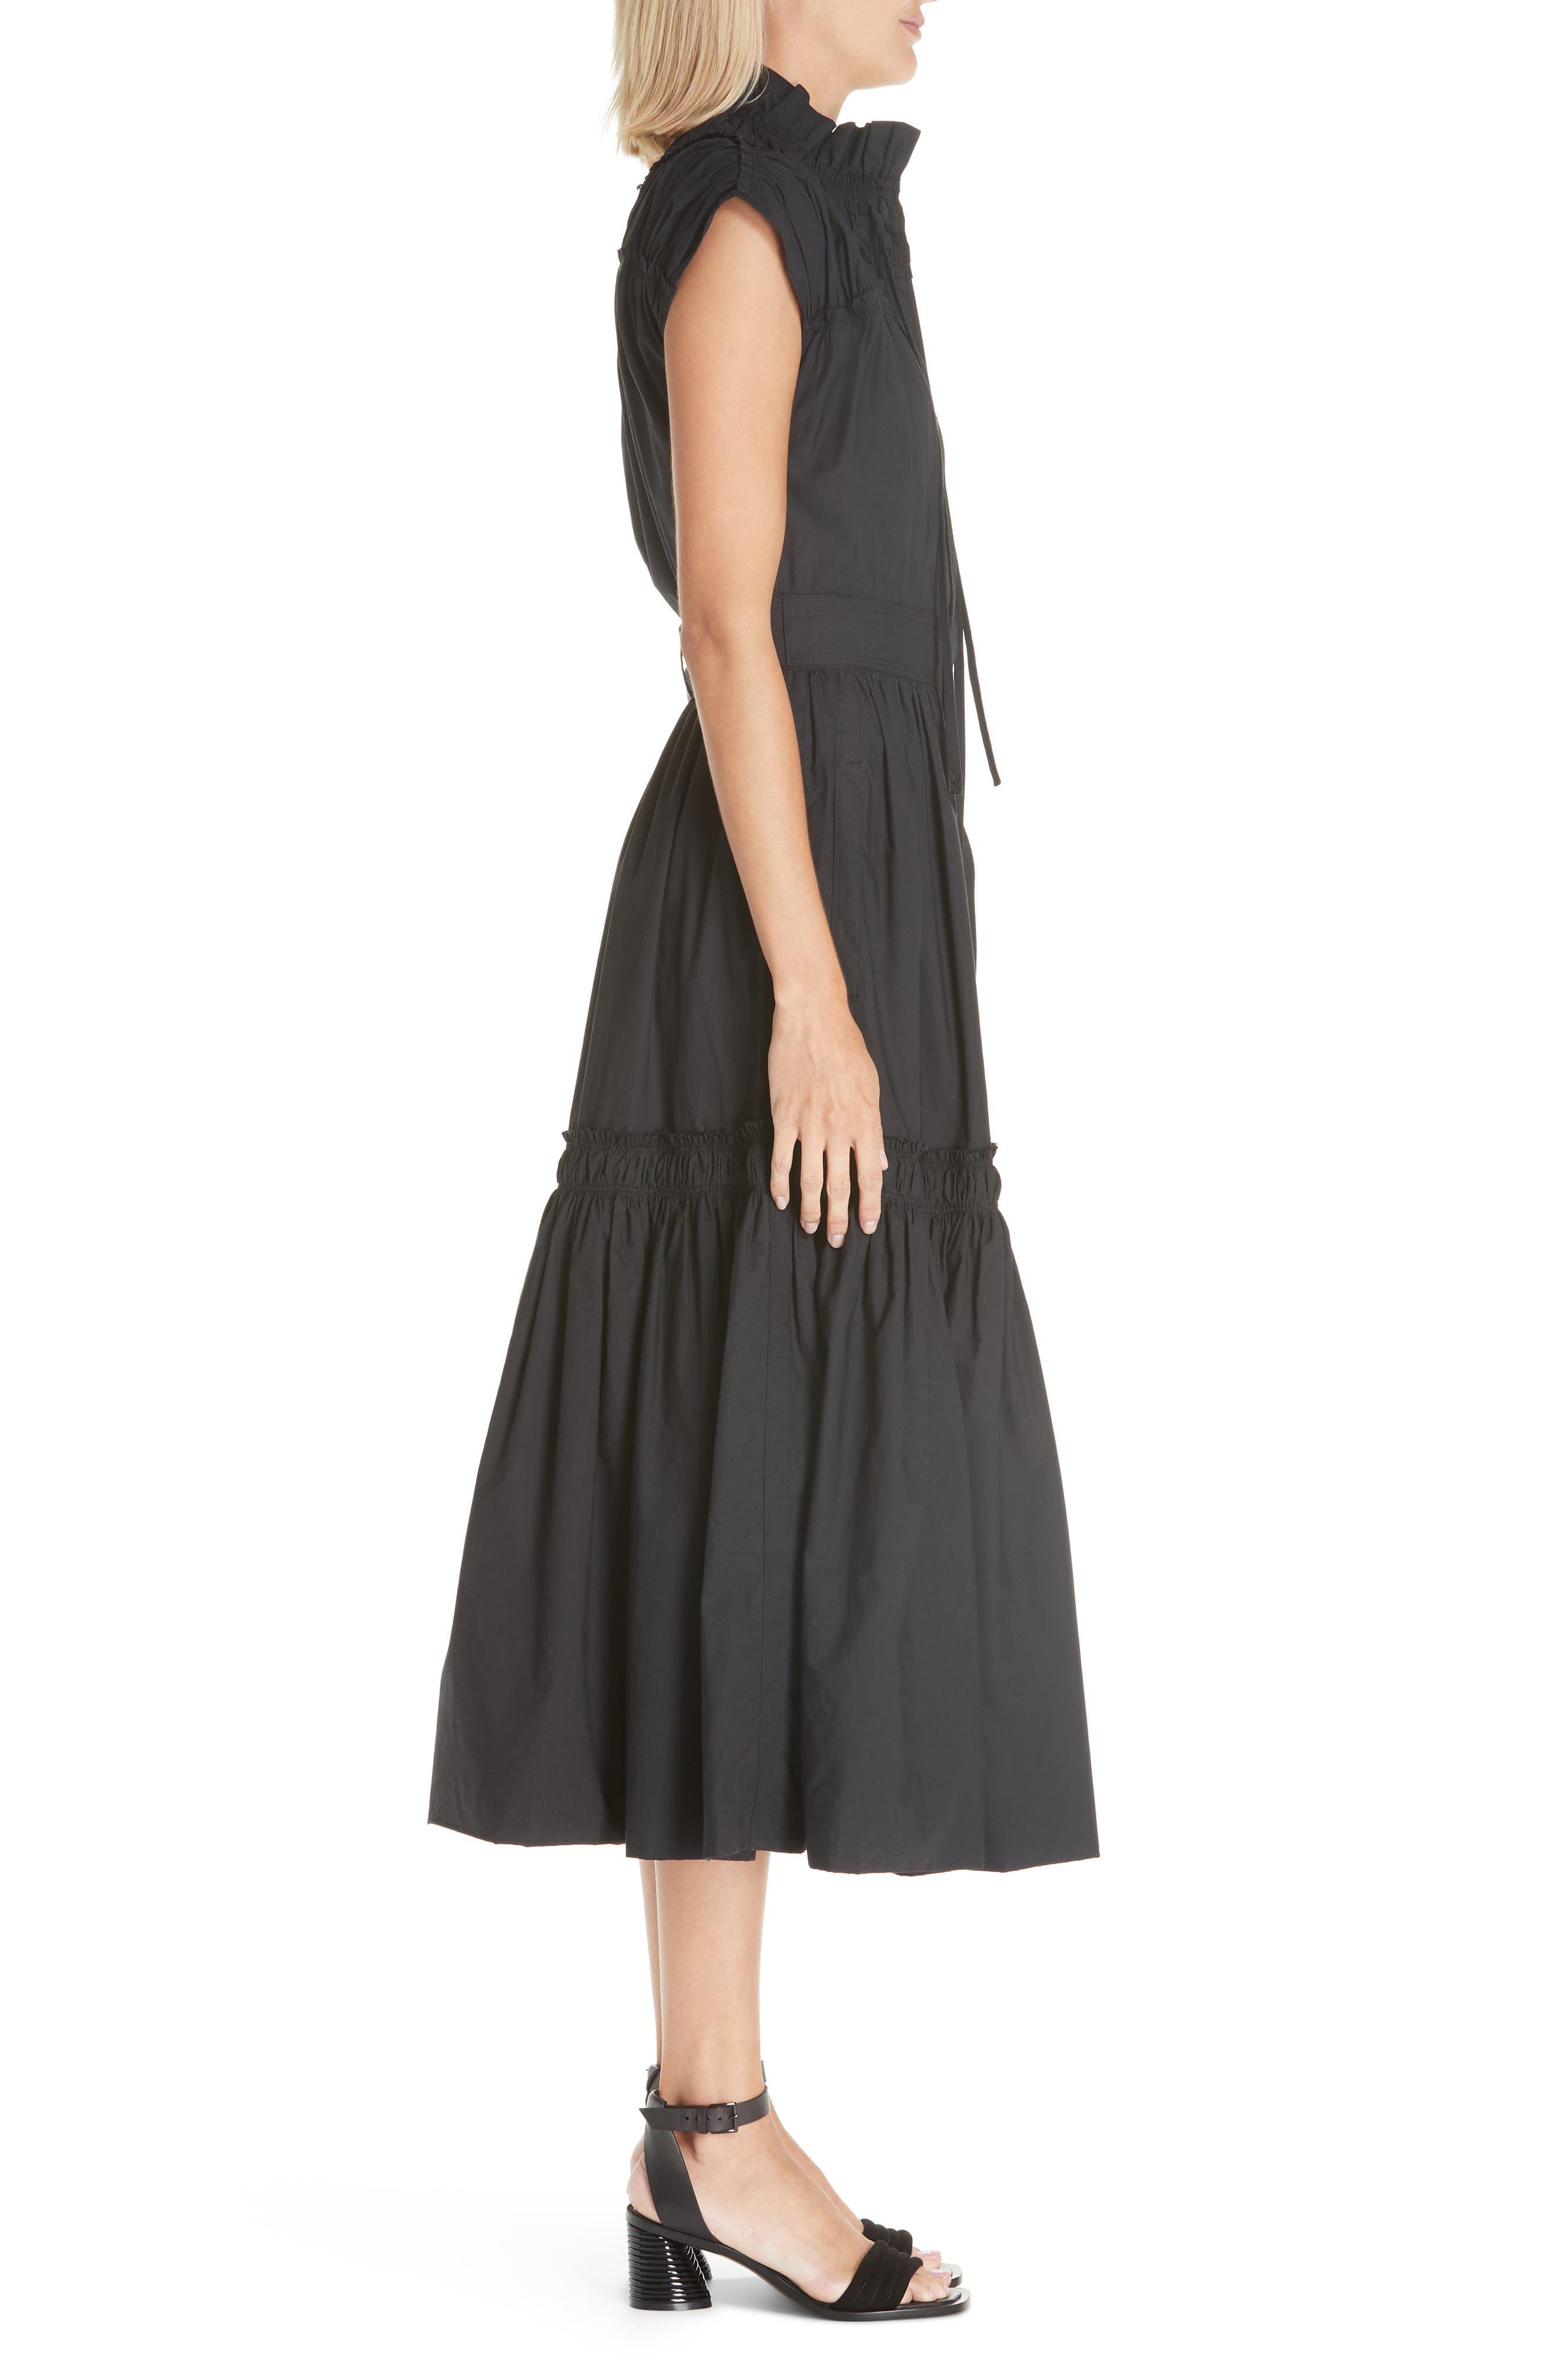 PROENZA SCHOULER, Smocked Poplin Dress, Alternate thumbnail 4, color, BLACK